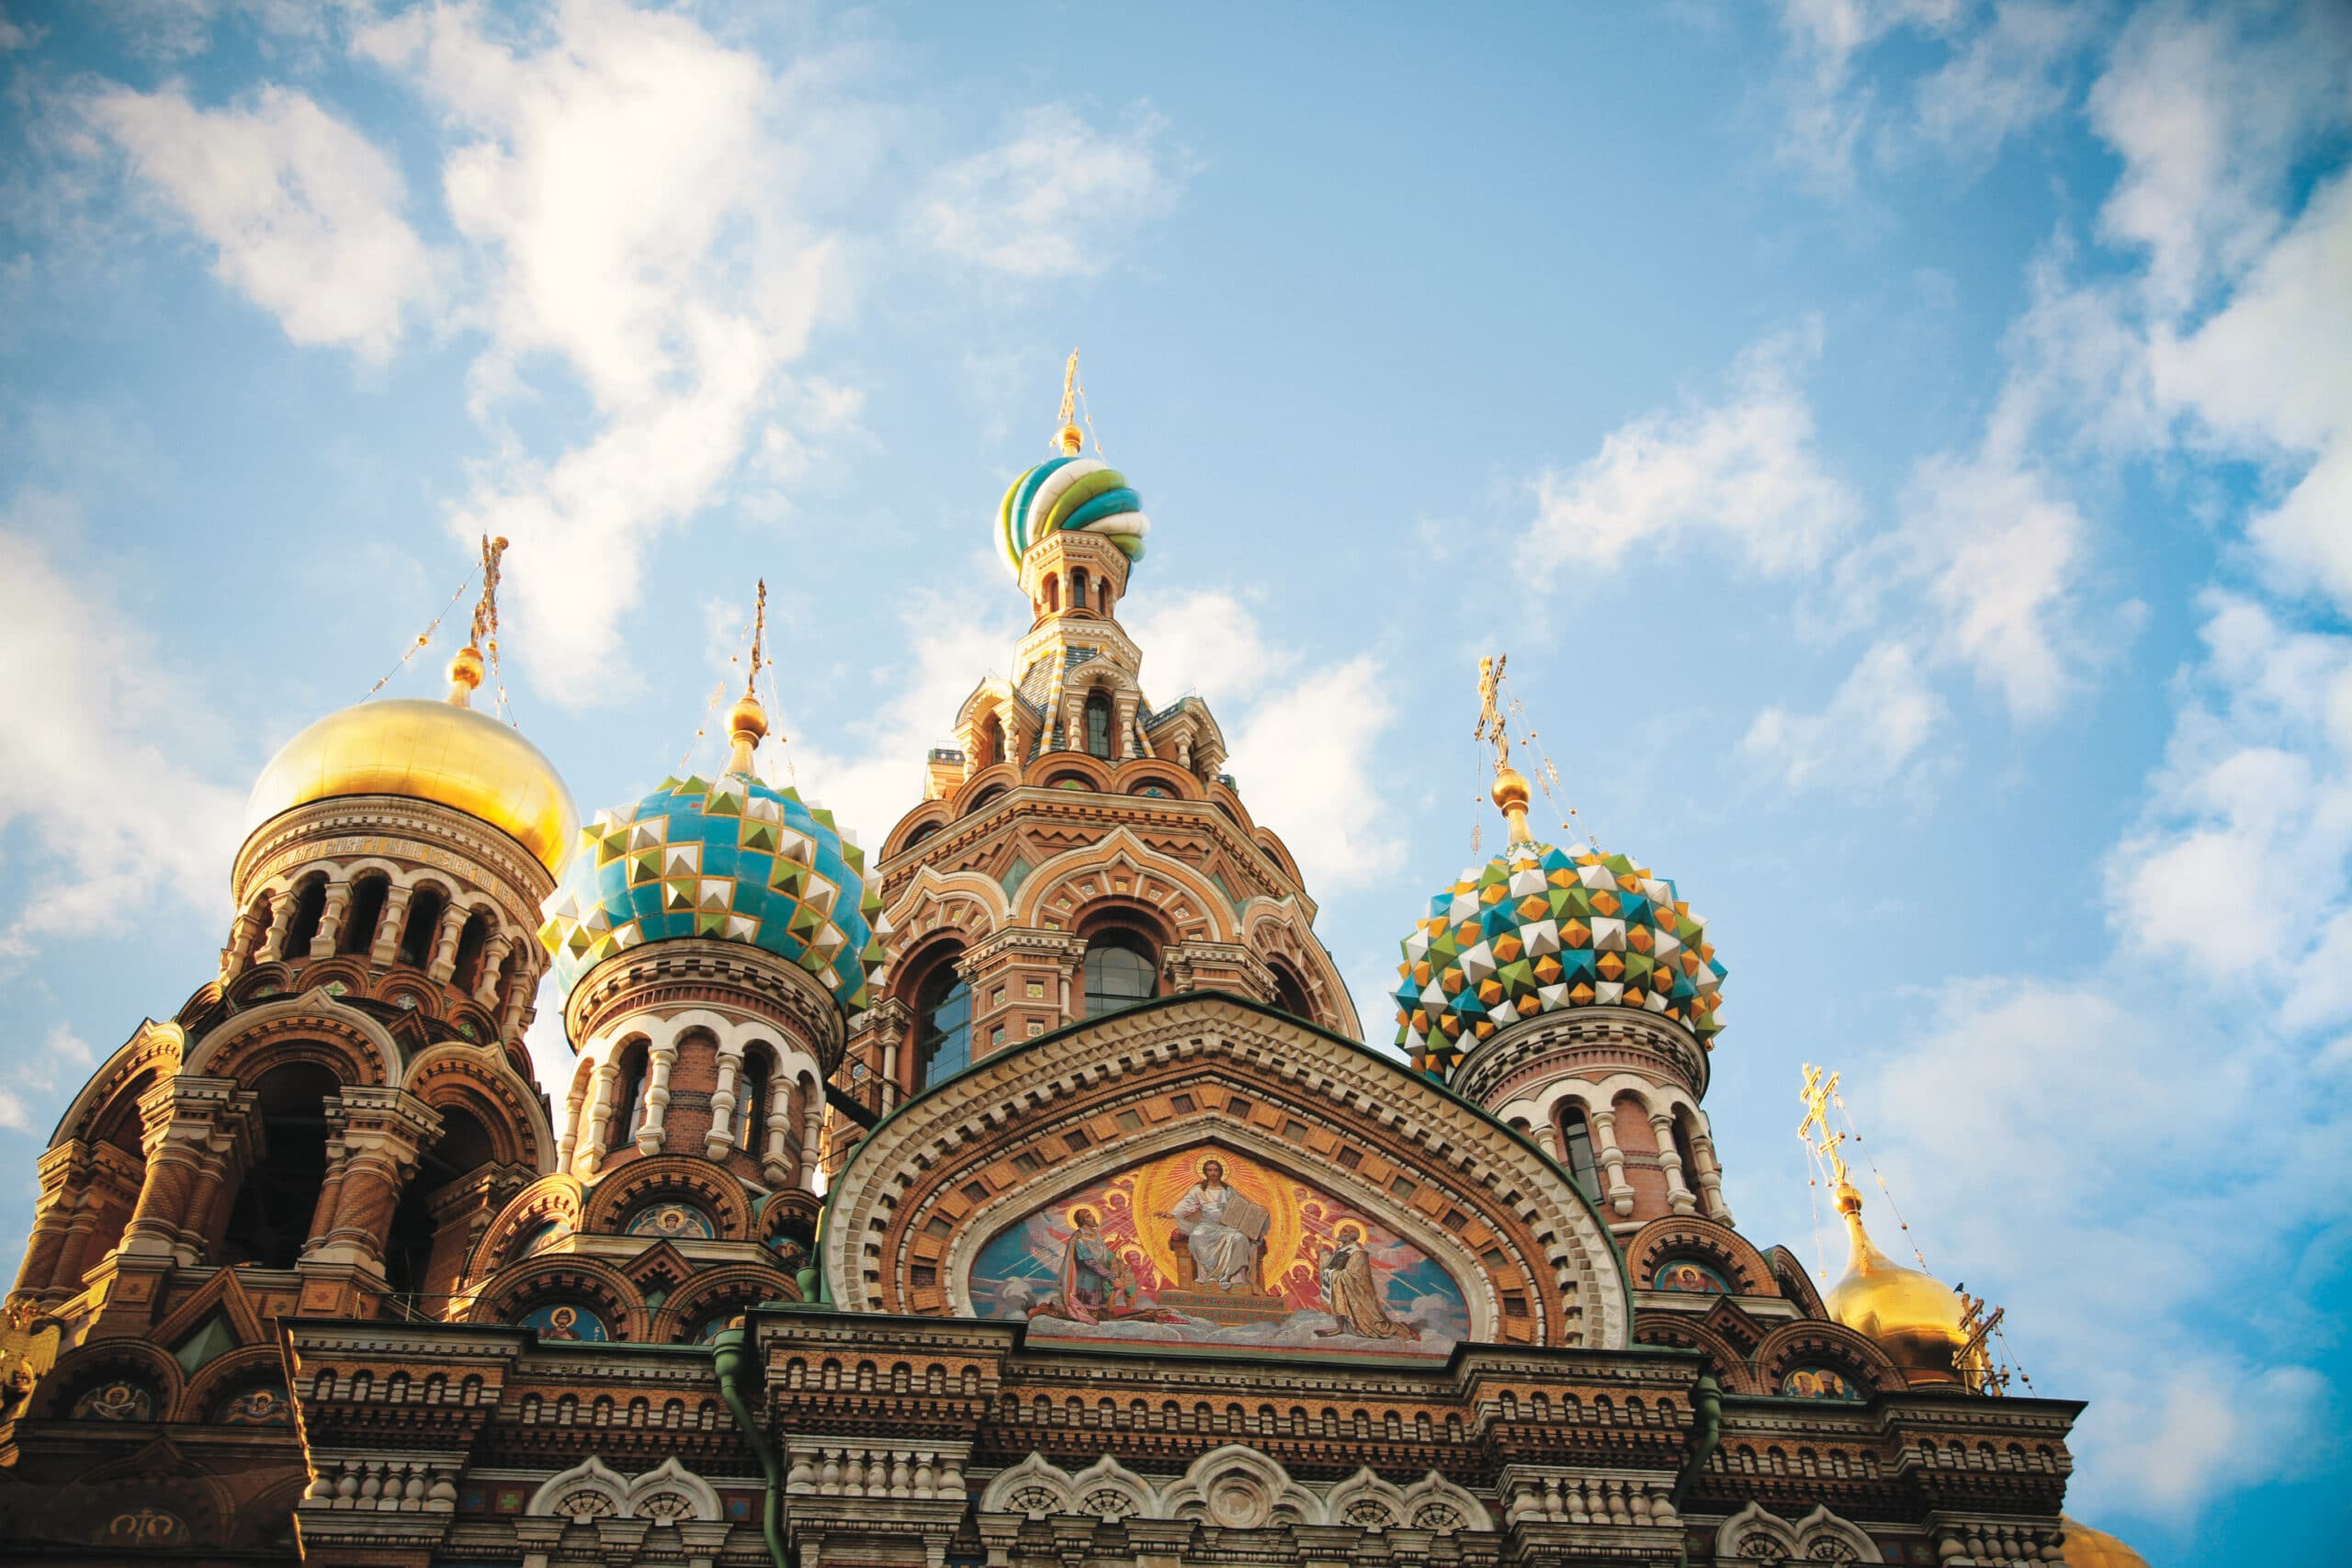 Noord-Europa-St-Petersburg-Rusland-Kerk-vd-Verlosser-Peter-de-Groot